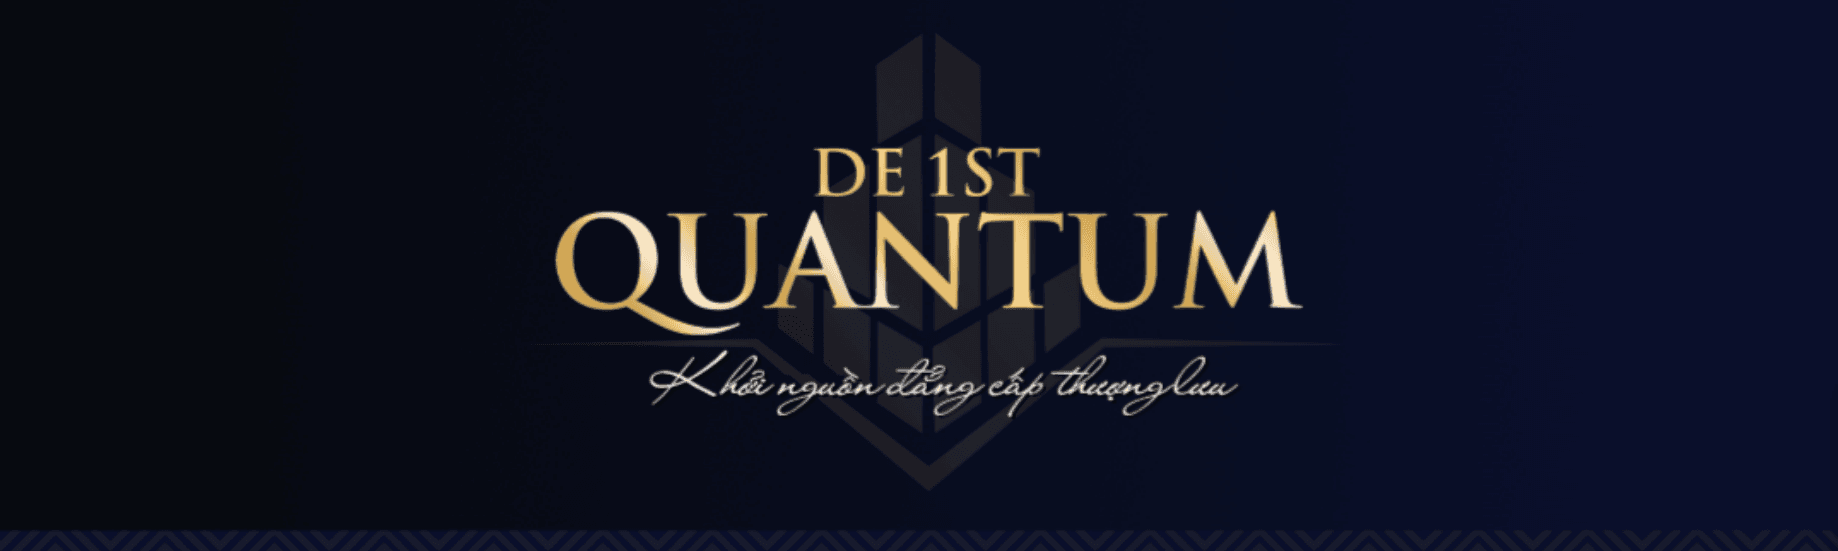 logo de 1st quantum